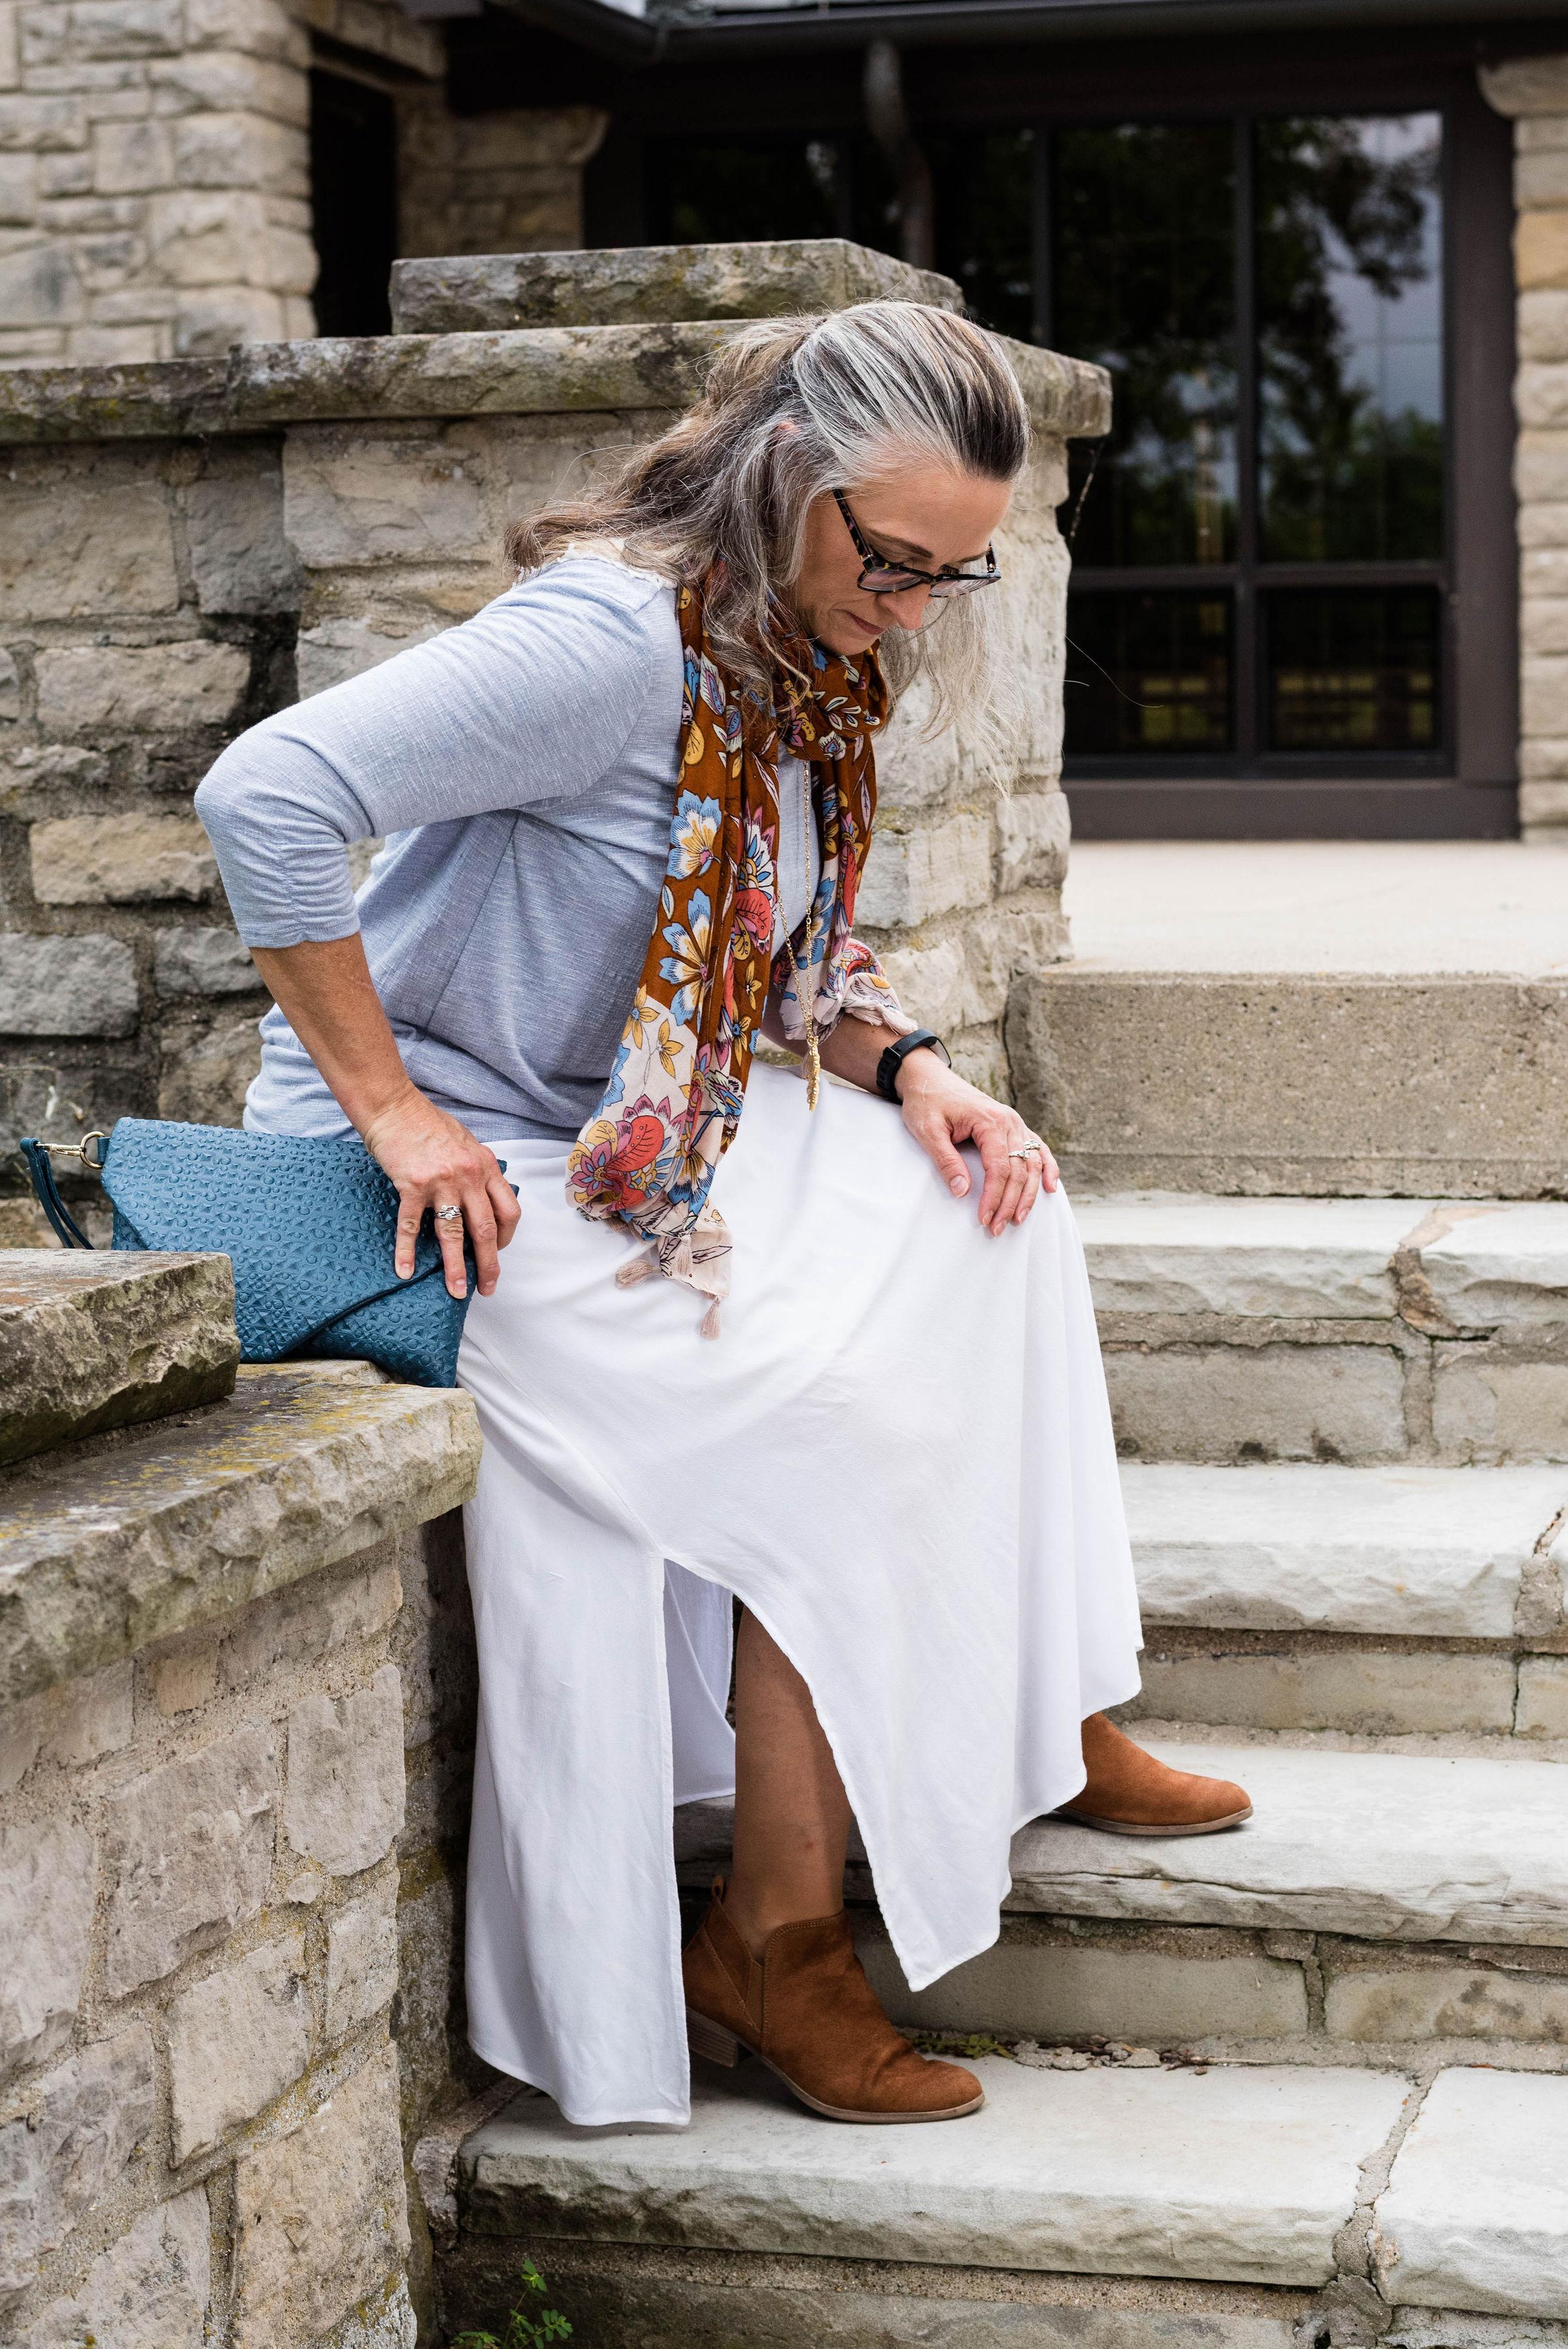 Wearing white - maxi skirt